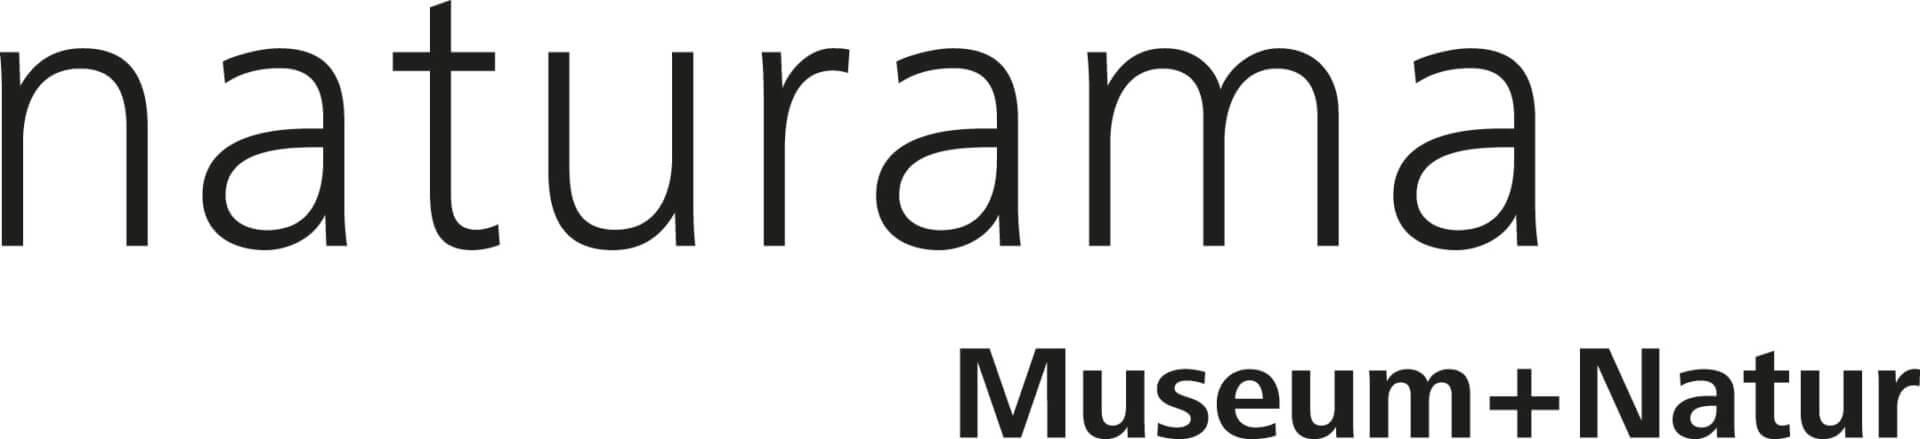 Stiftung Naturama Aargau